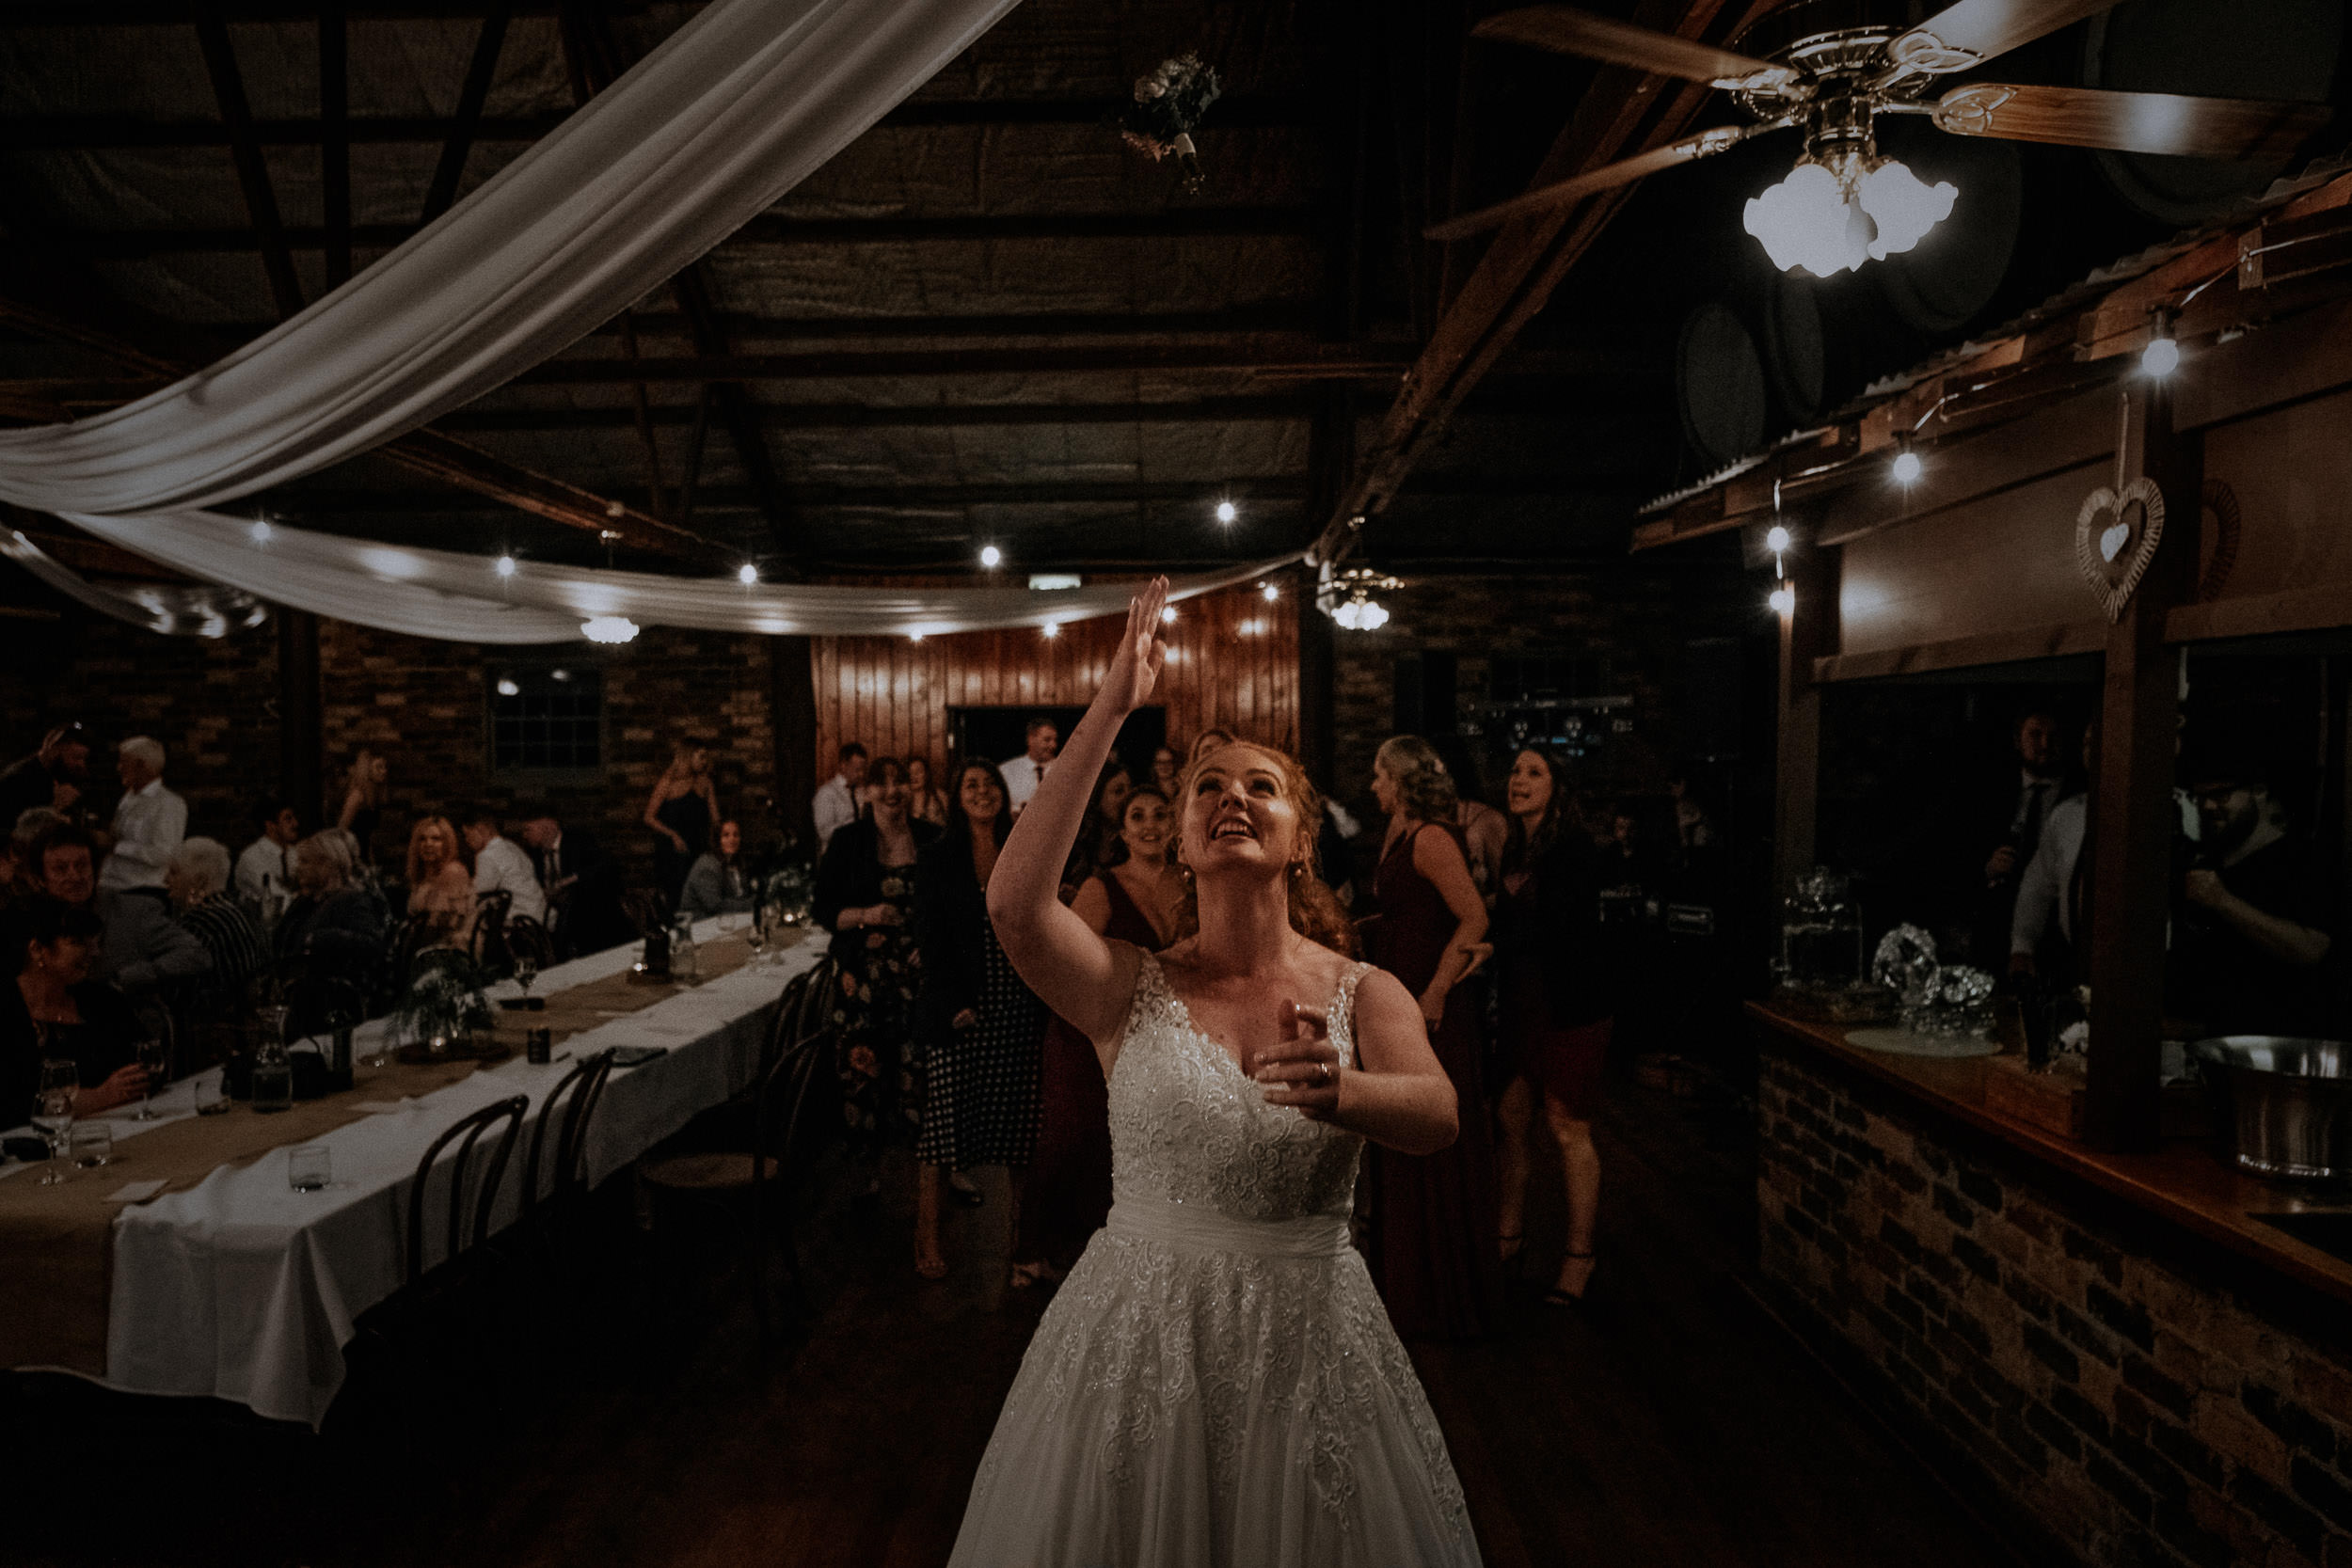 sav & mike_elopement wedding photography_kings & thieves_blog (21 of 44).jpg